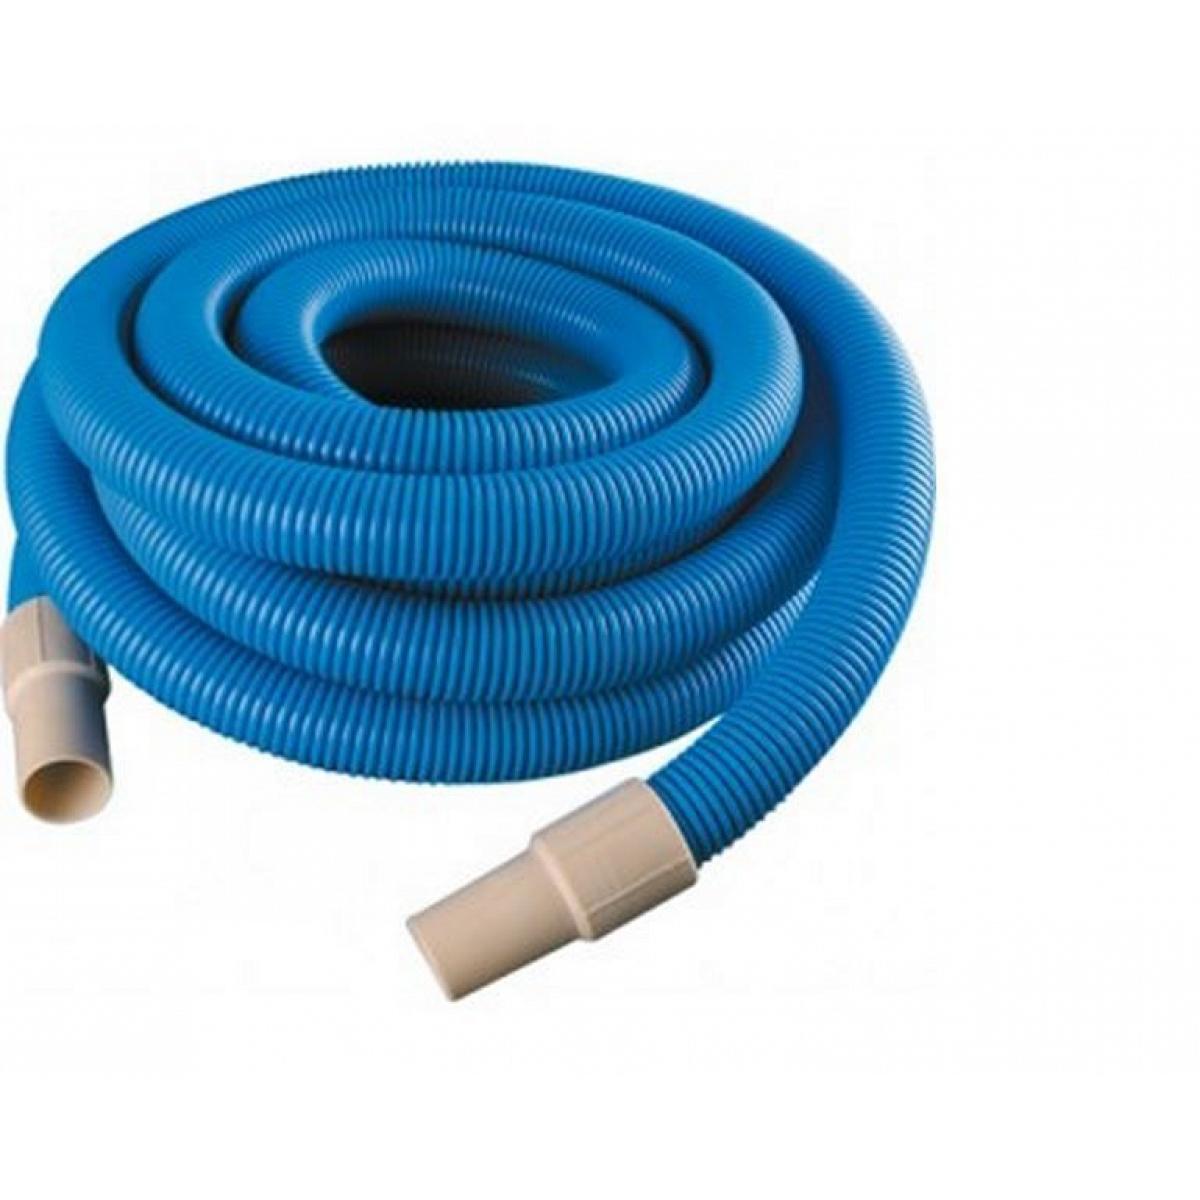 Filter Pump Hose Alianto 38x12 Ailanto Pool Accessories